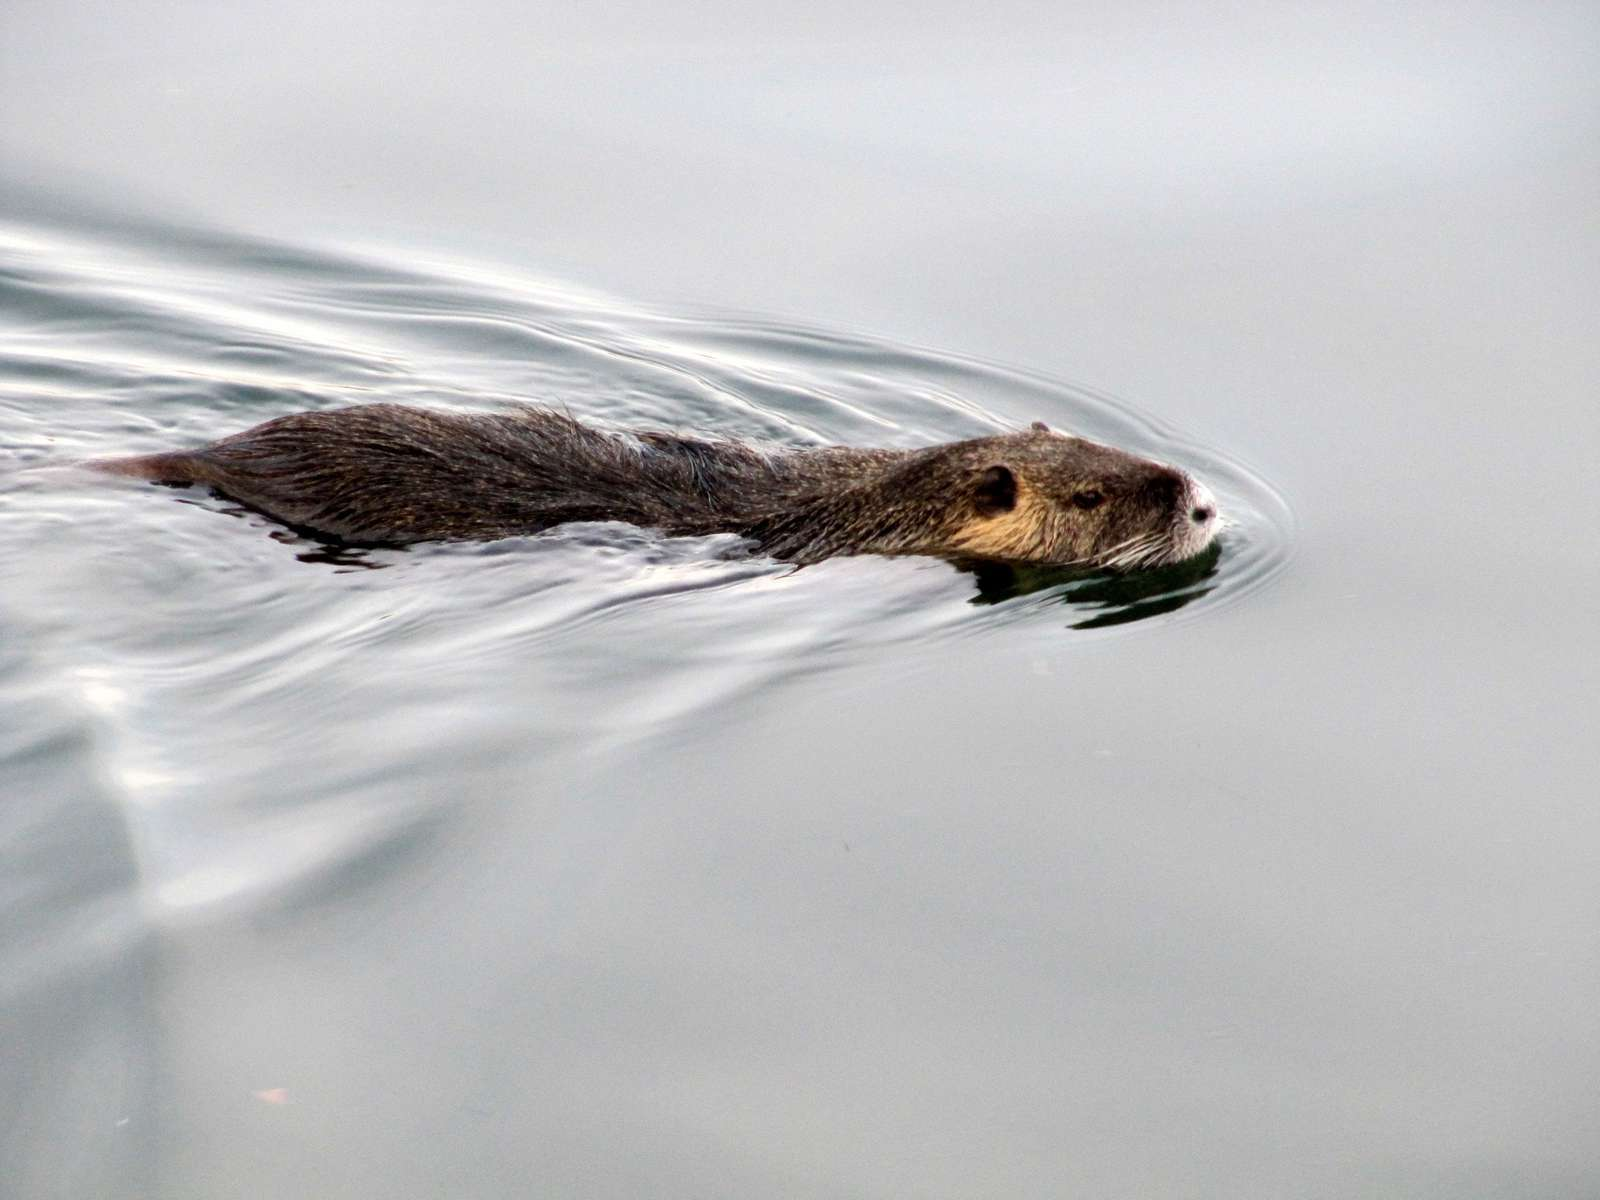 Ragondin (Myocastor coypus) en train de nager